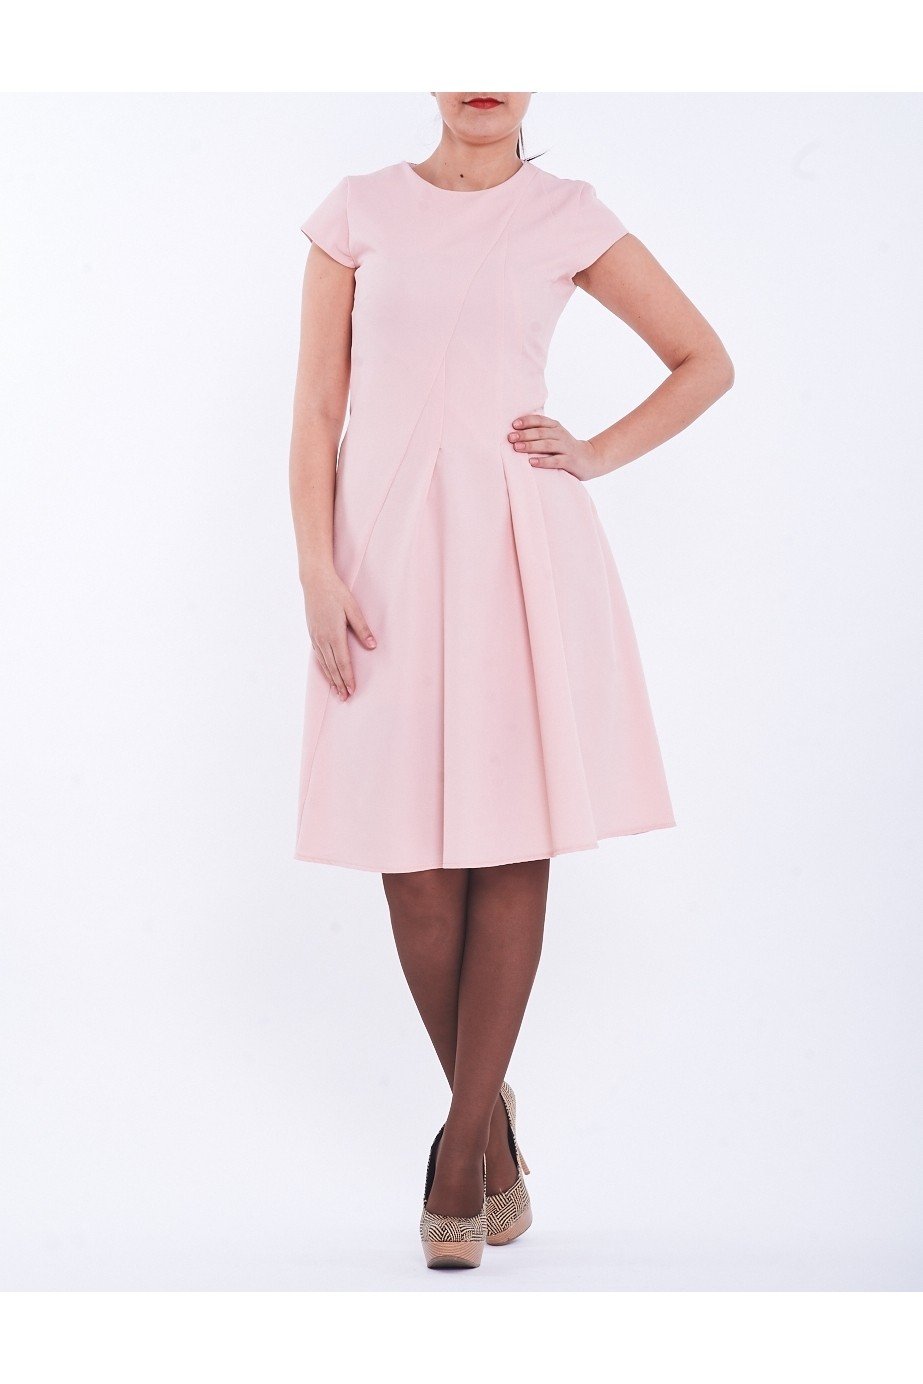 Rochie roz pal cu pliuri pe partea stanga TinaR 44